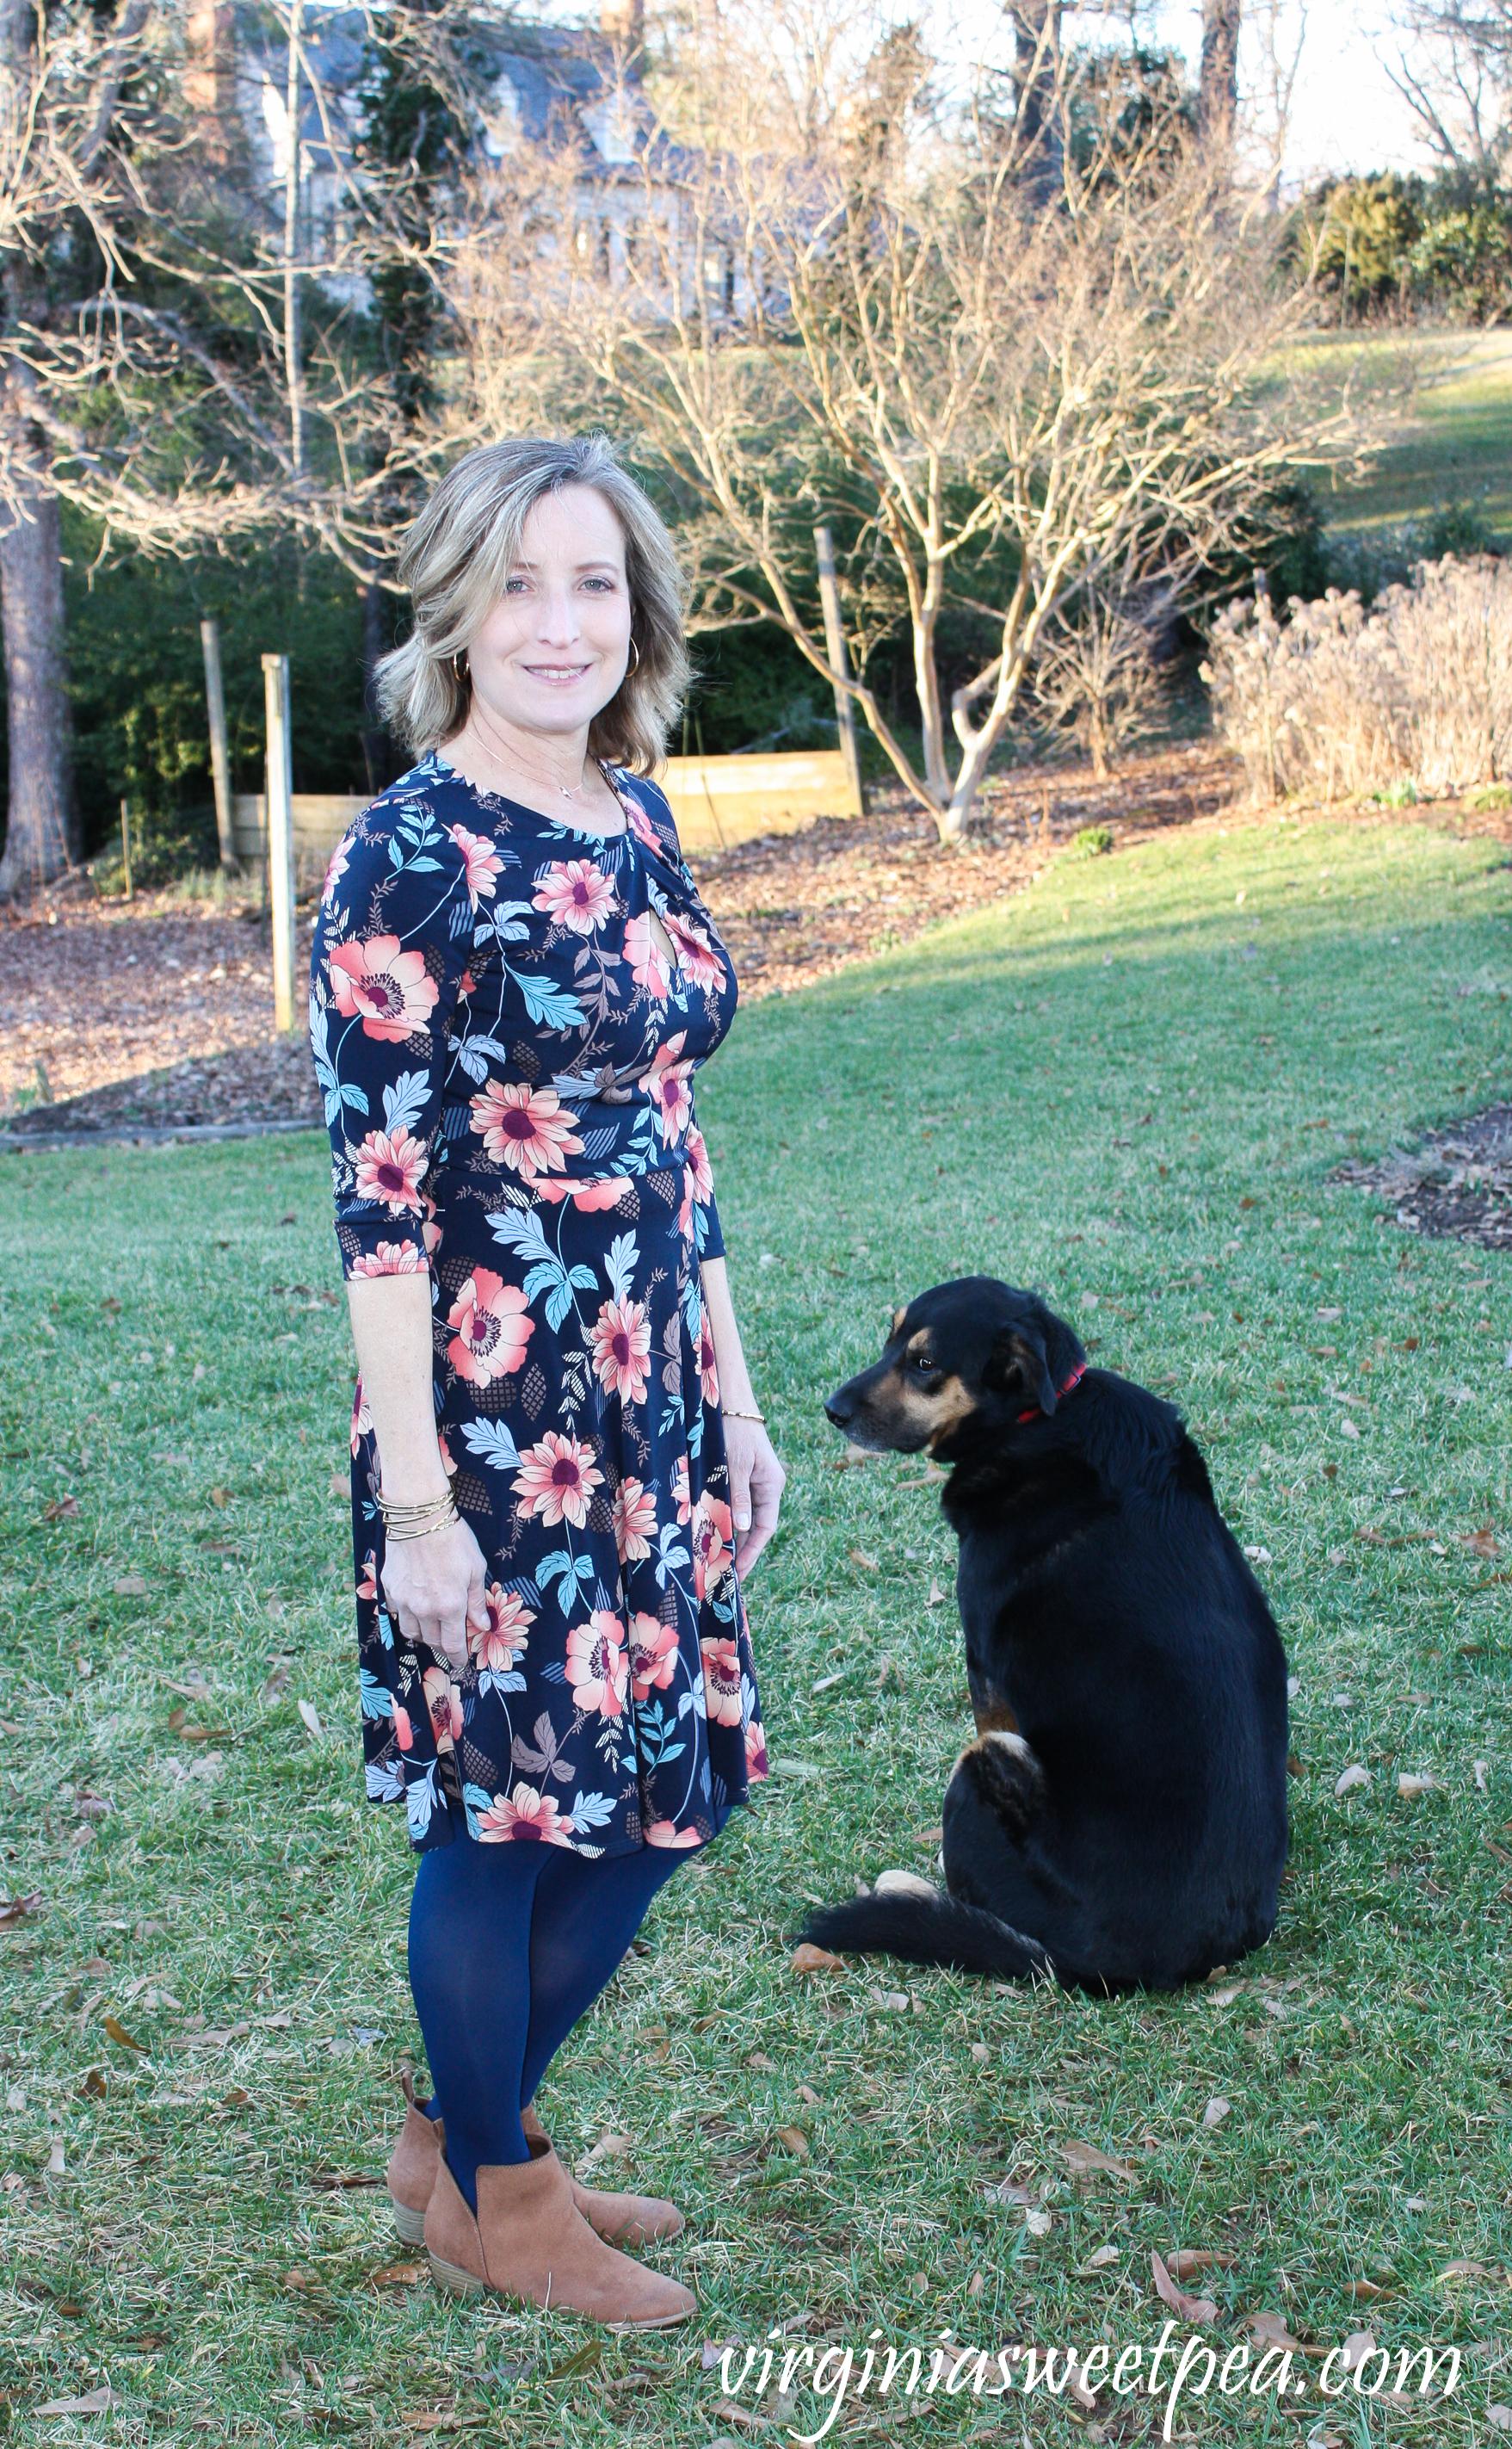 Stitch Fix Review for March 2019 - Wisp Kellen Knit Dress #stitchfix #stitchfixreview #stitchfix2019 #springstitchfix #stitchfixspring #stitchfixdress #shermanskulina